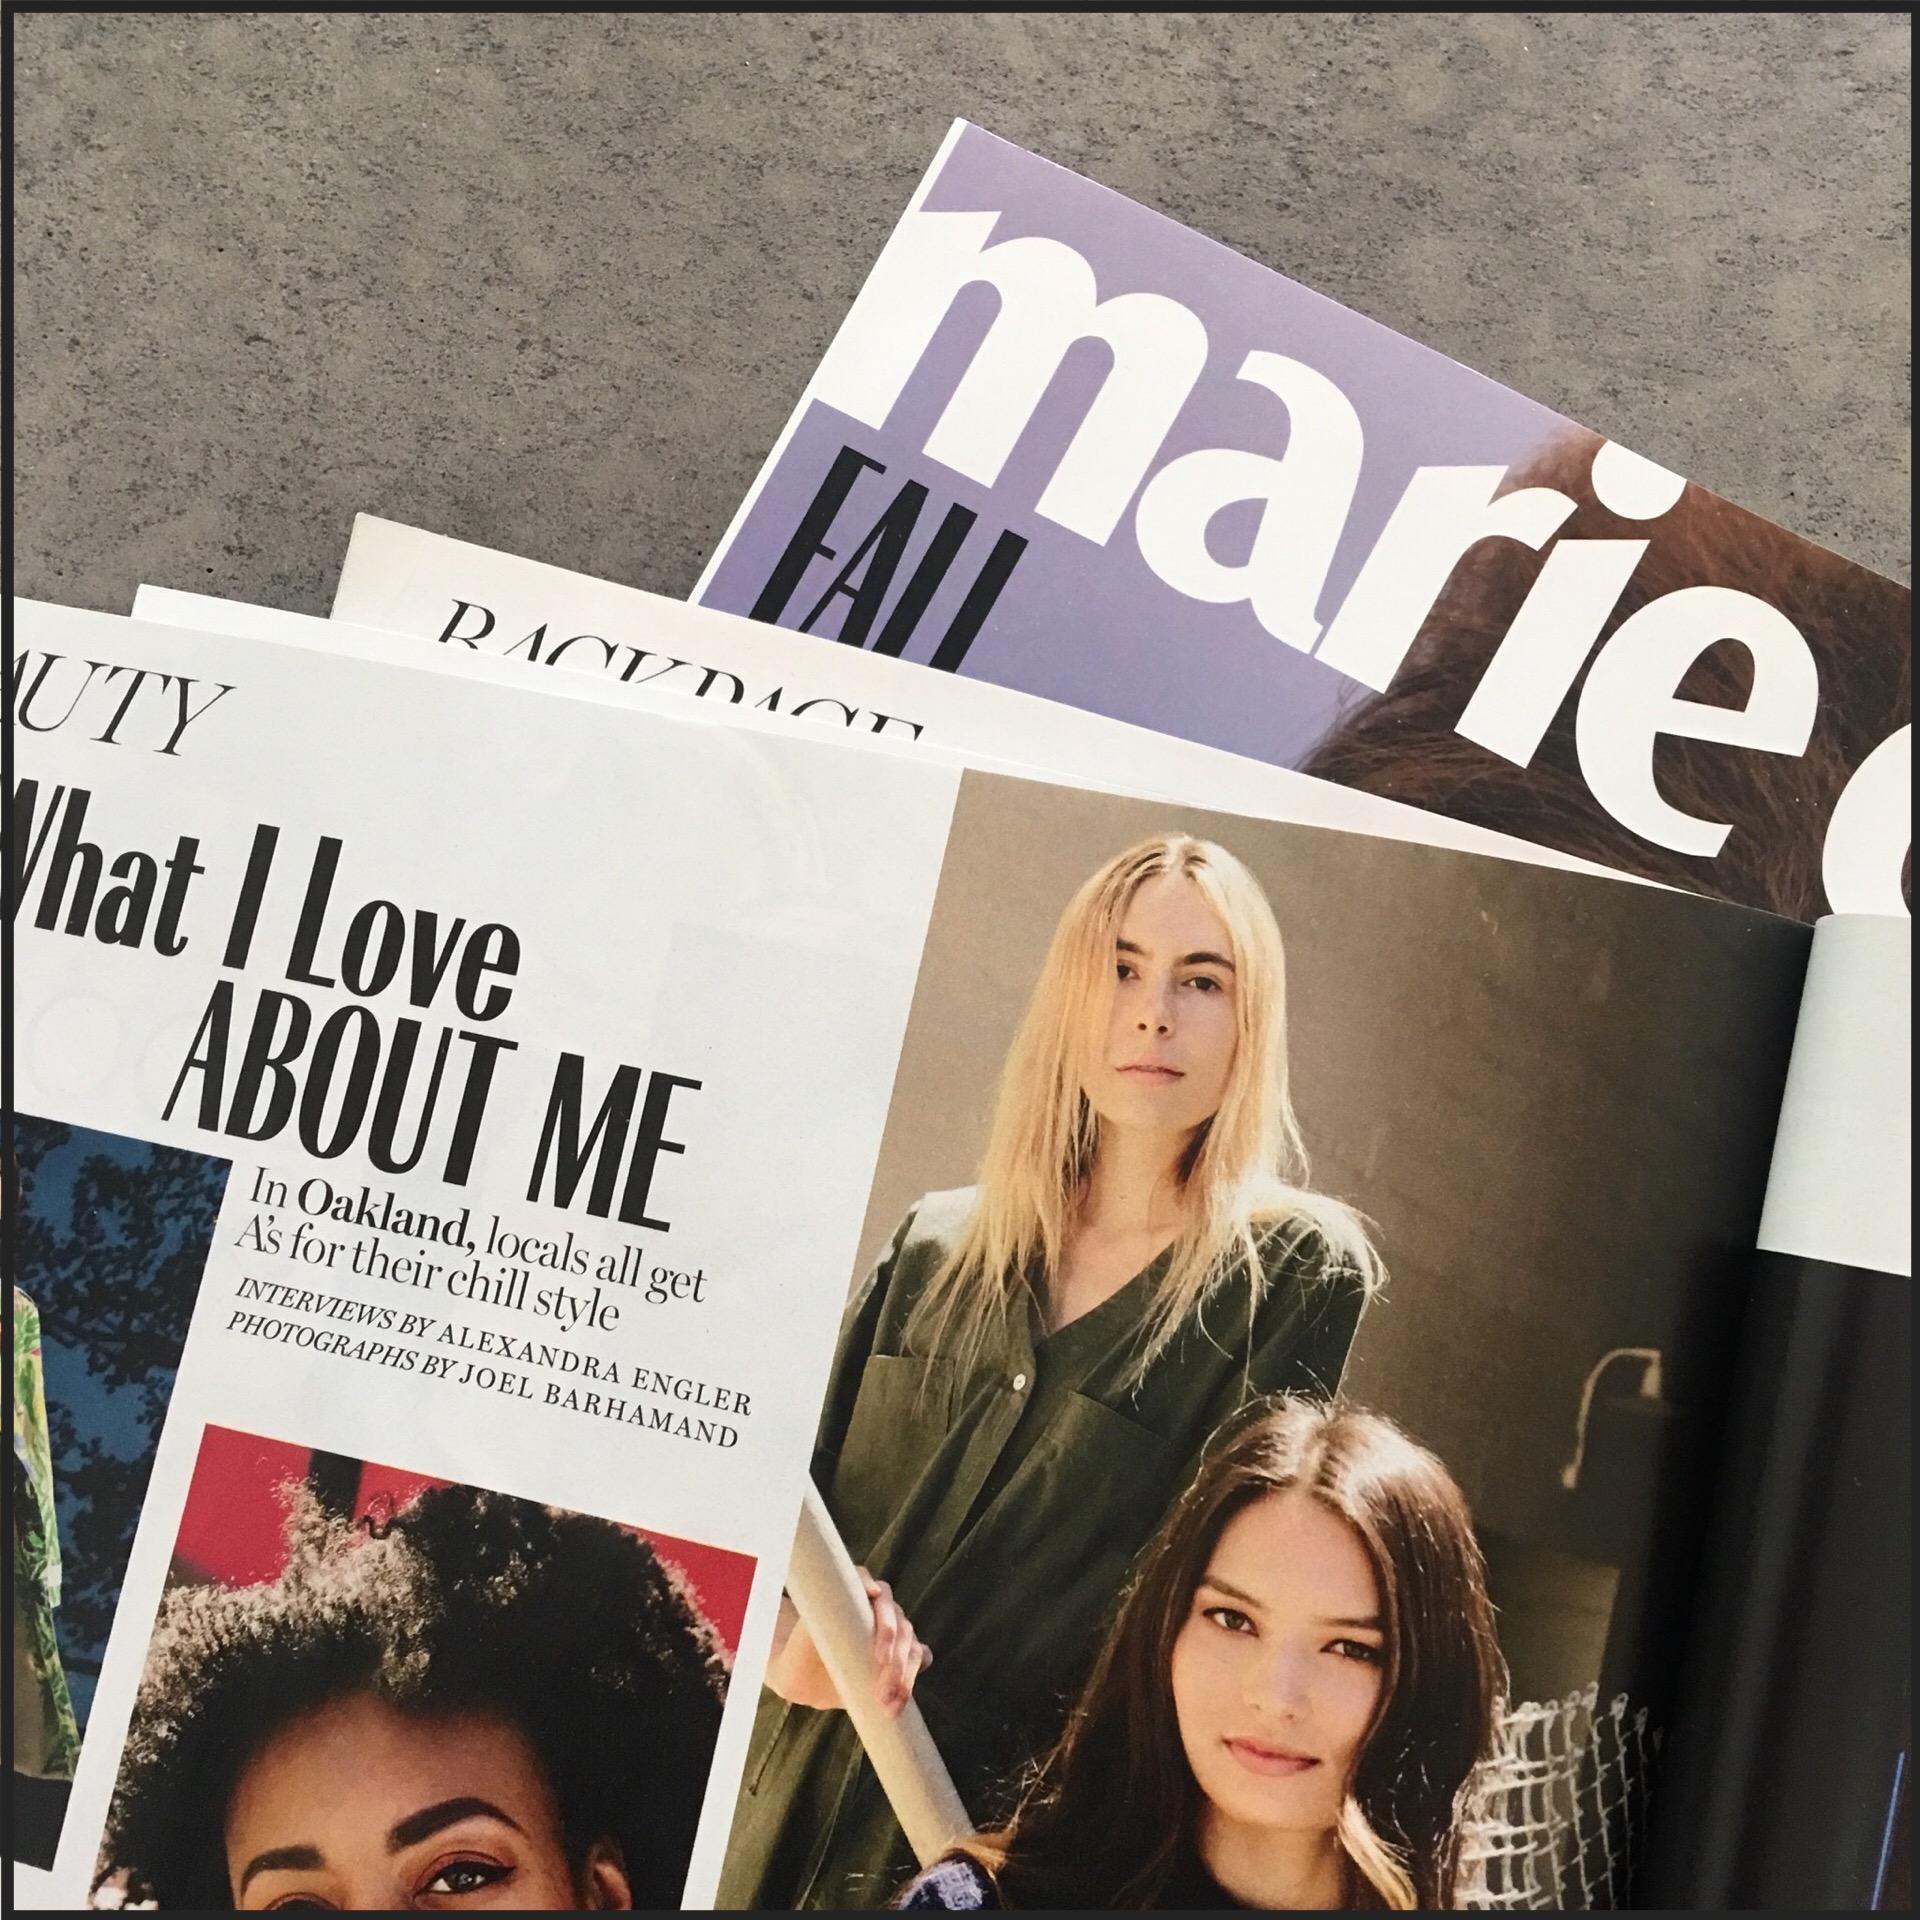 Logan in MARIE CLAIRE MAGAZINE Oct '18